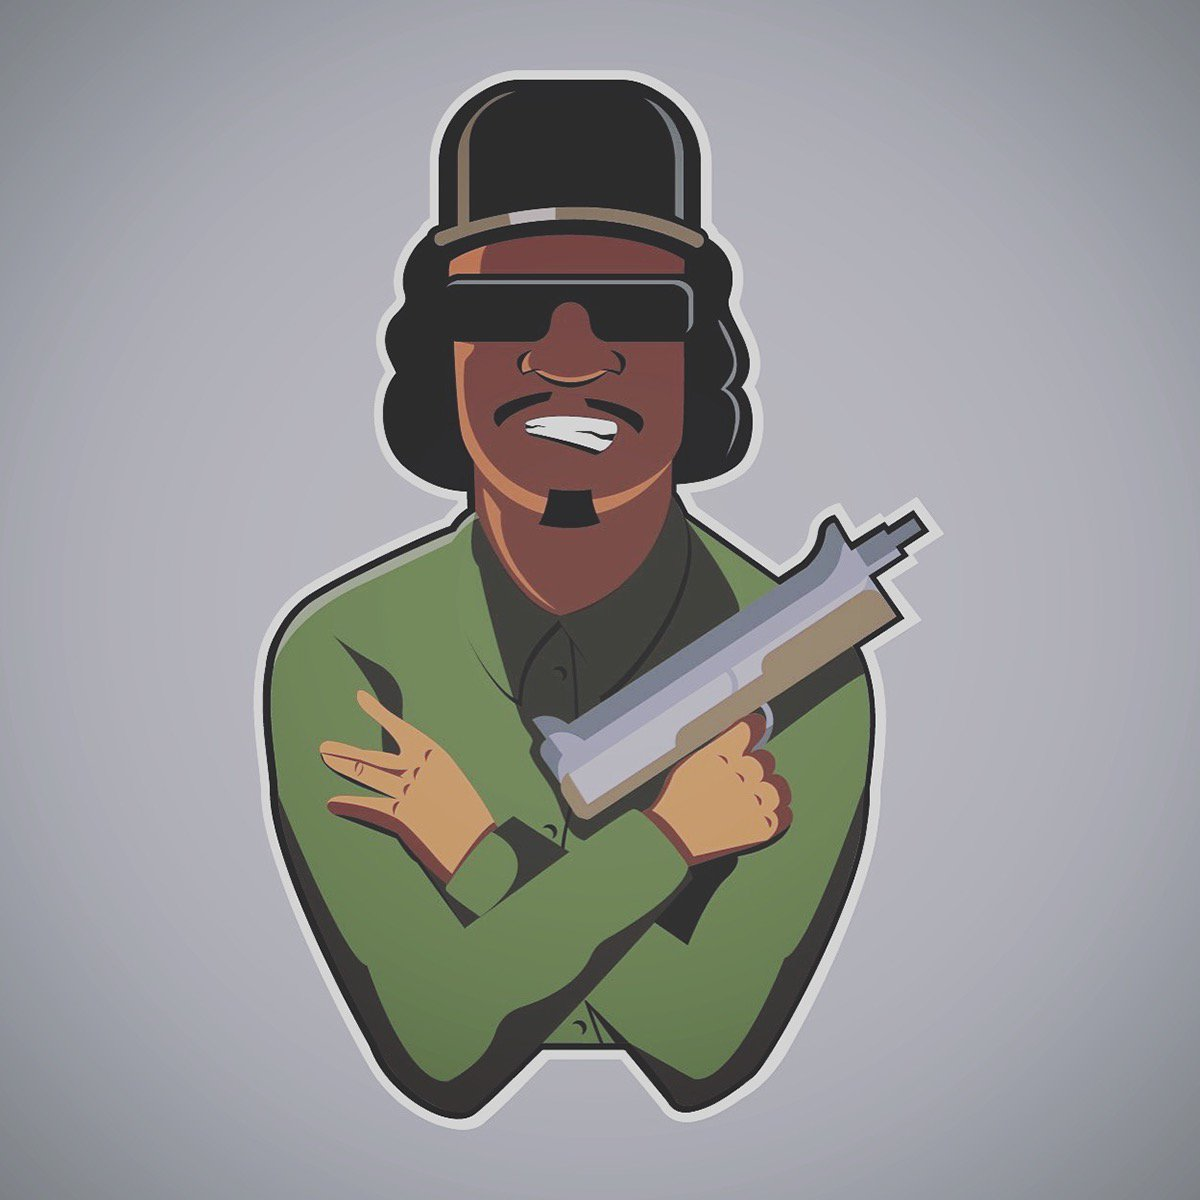 Rockstar Games On Twitter Fanart Legendary San Andreas Hustlers Big Smoke Ryder Done Up As Fun Caricature Stickers By Artist Yuri Zalipaev